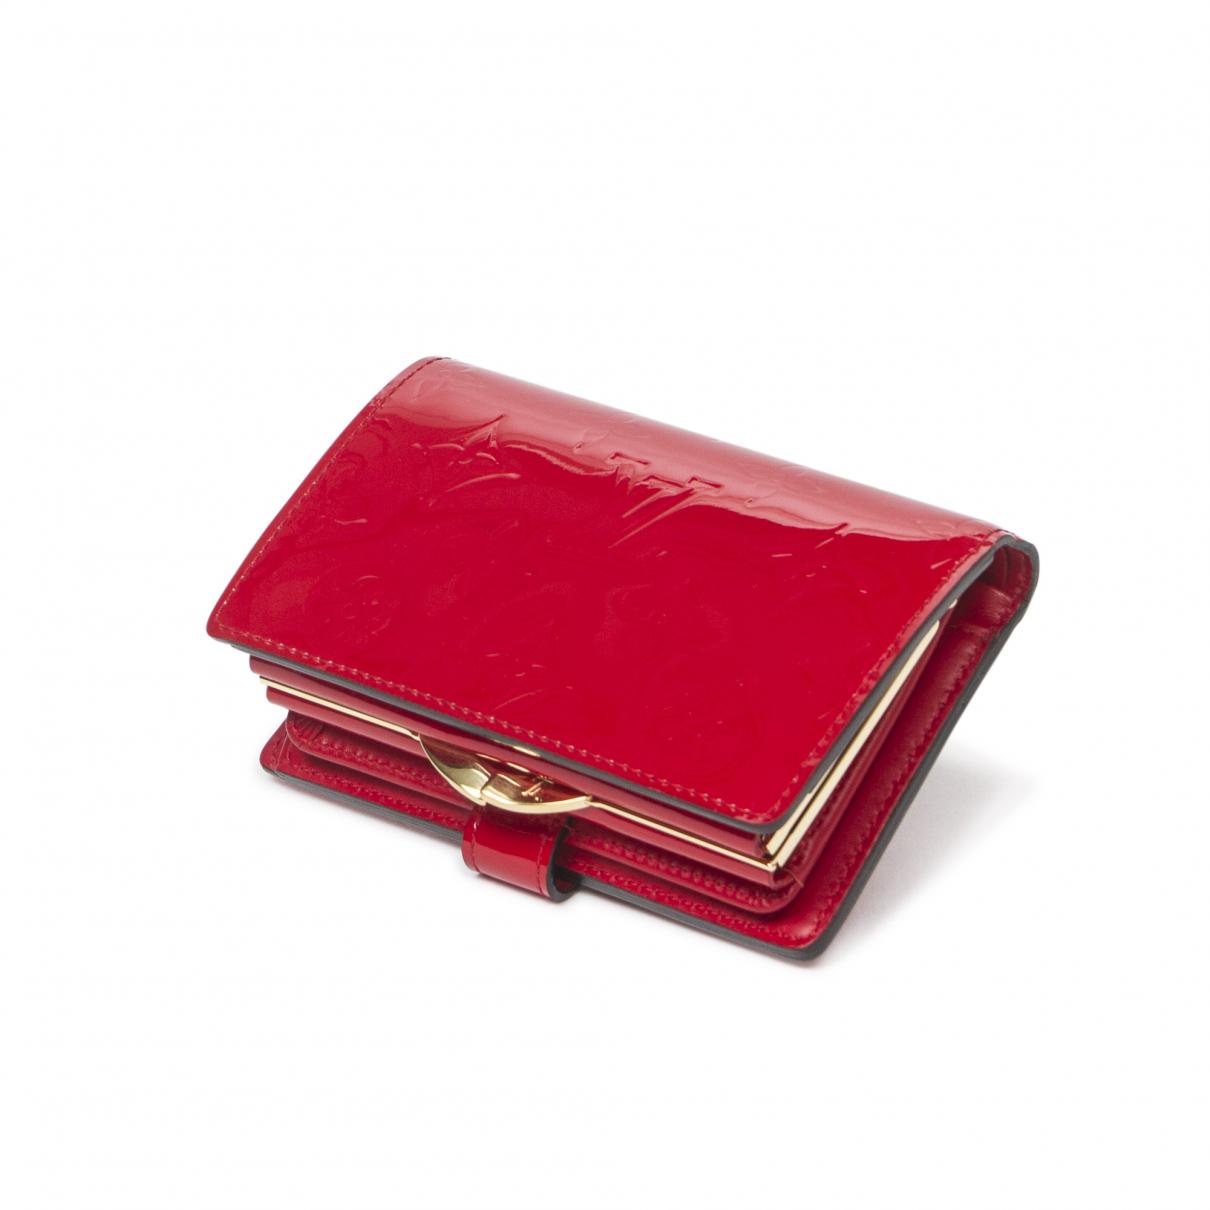 Louis Vuitton \N Portemonnaie in  Rot Lackleder